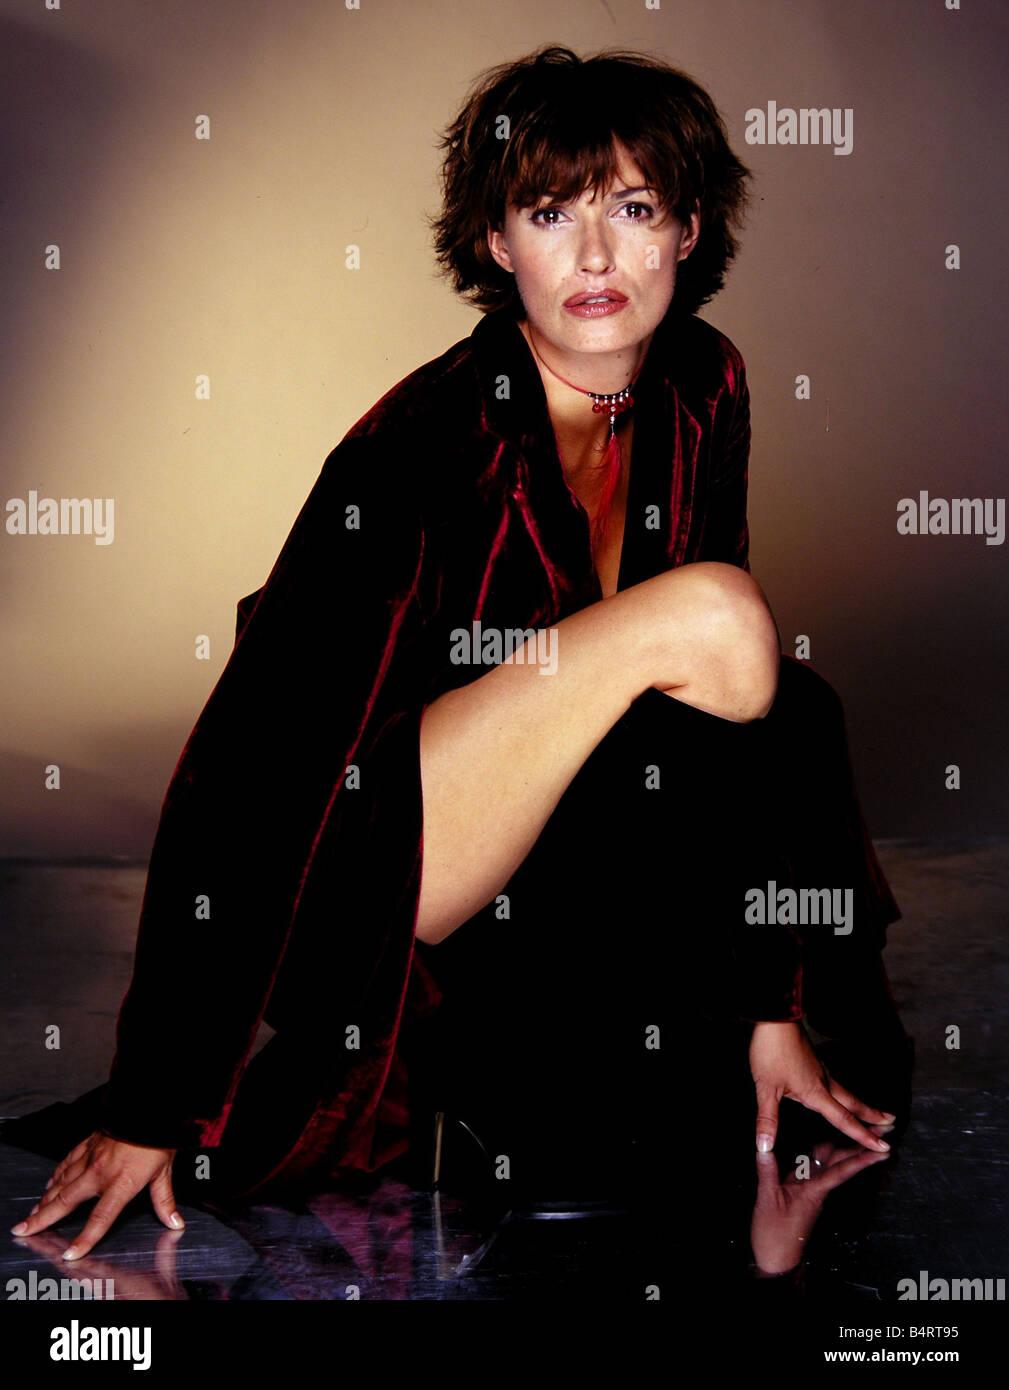 Yui Ichikawa (b. 1986 Later became an actress. forecasting